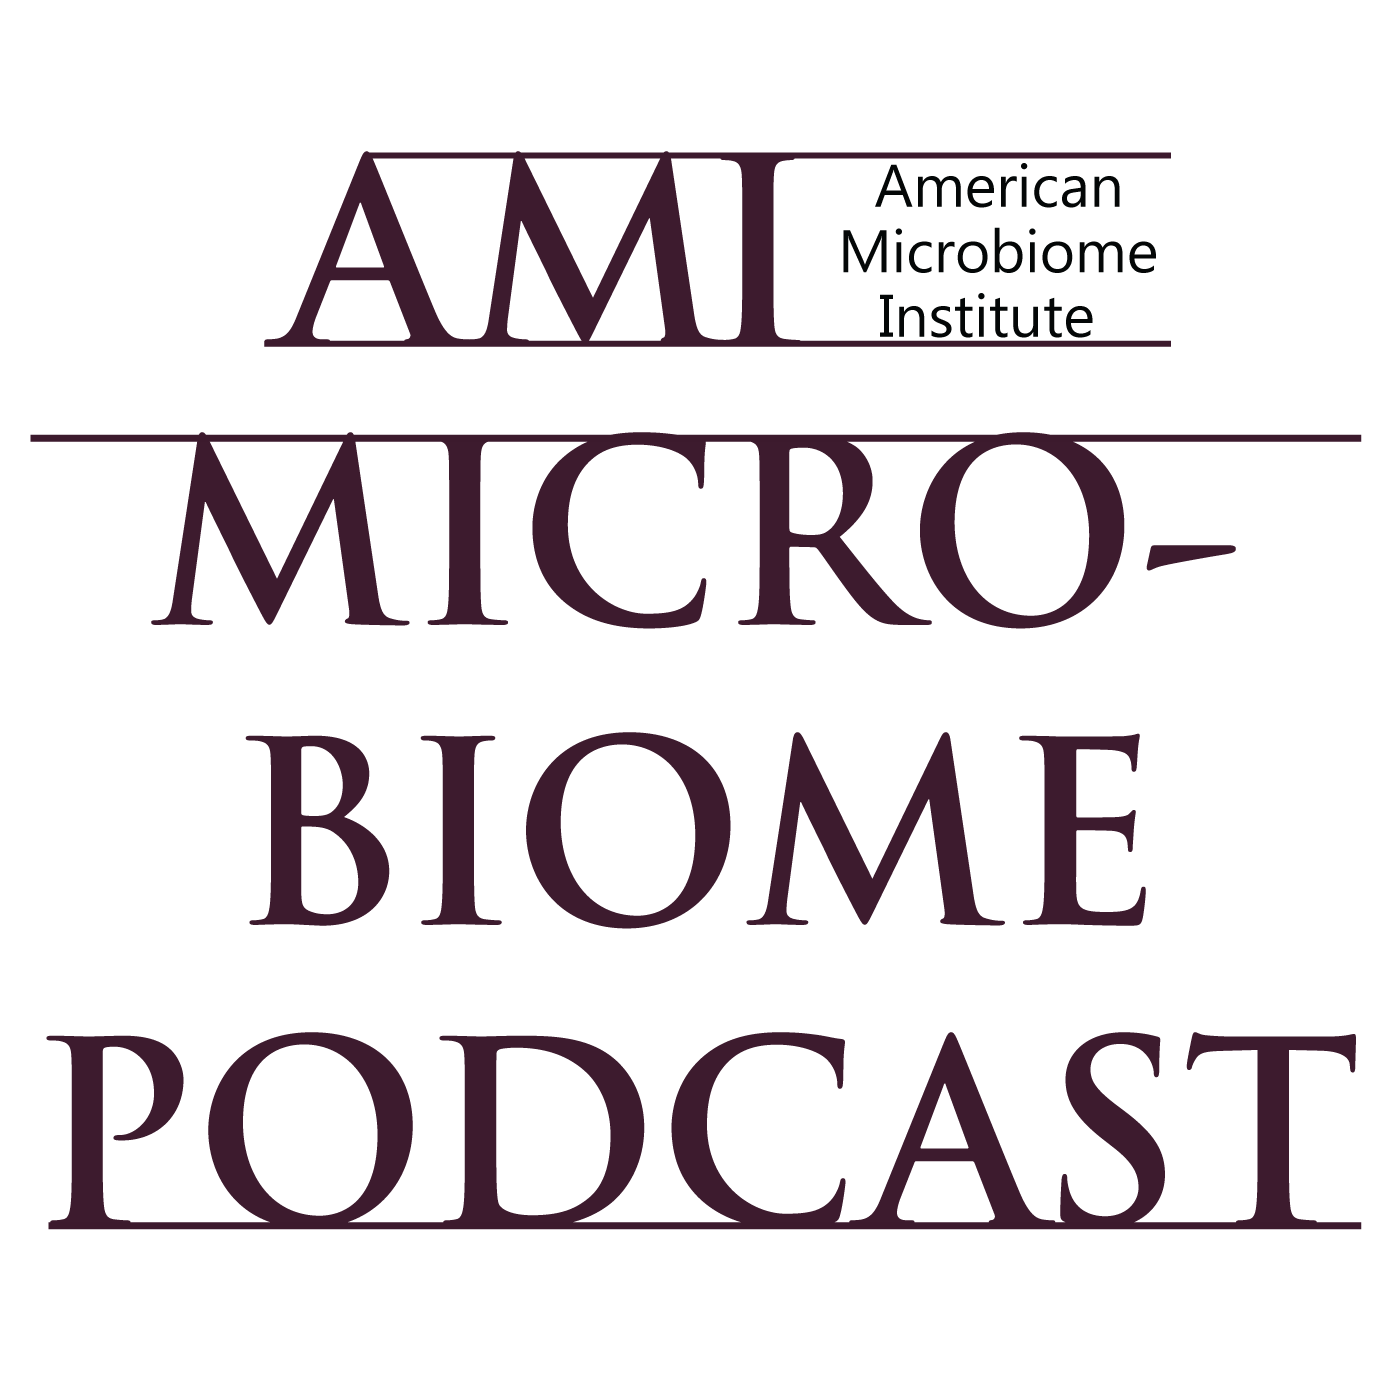 The Microbiome Podcast logo